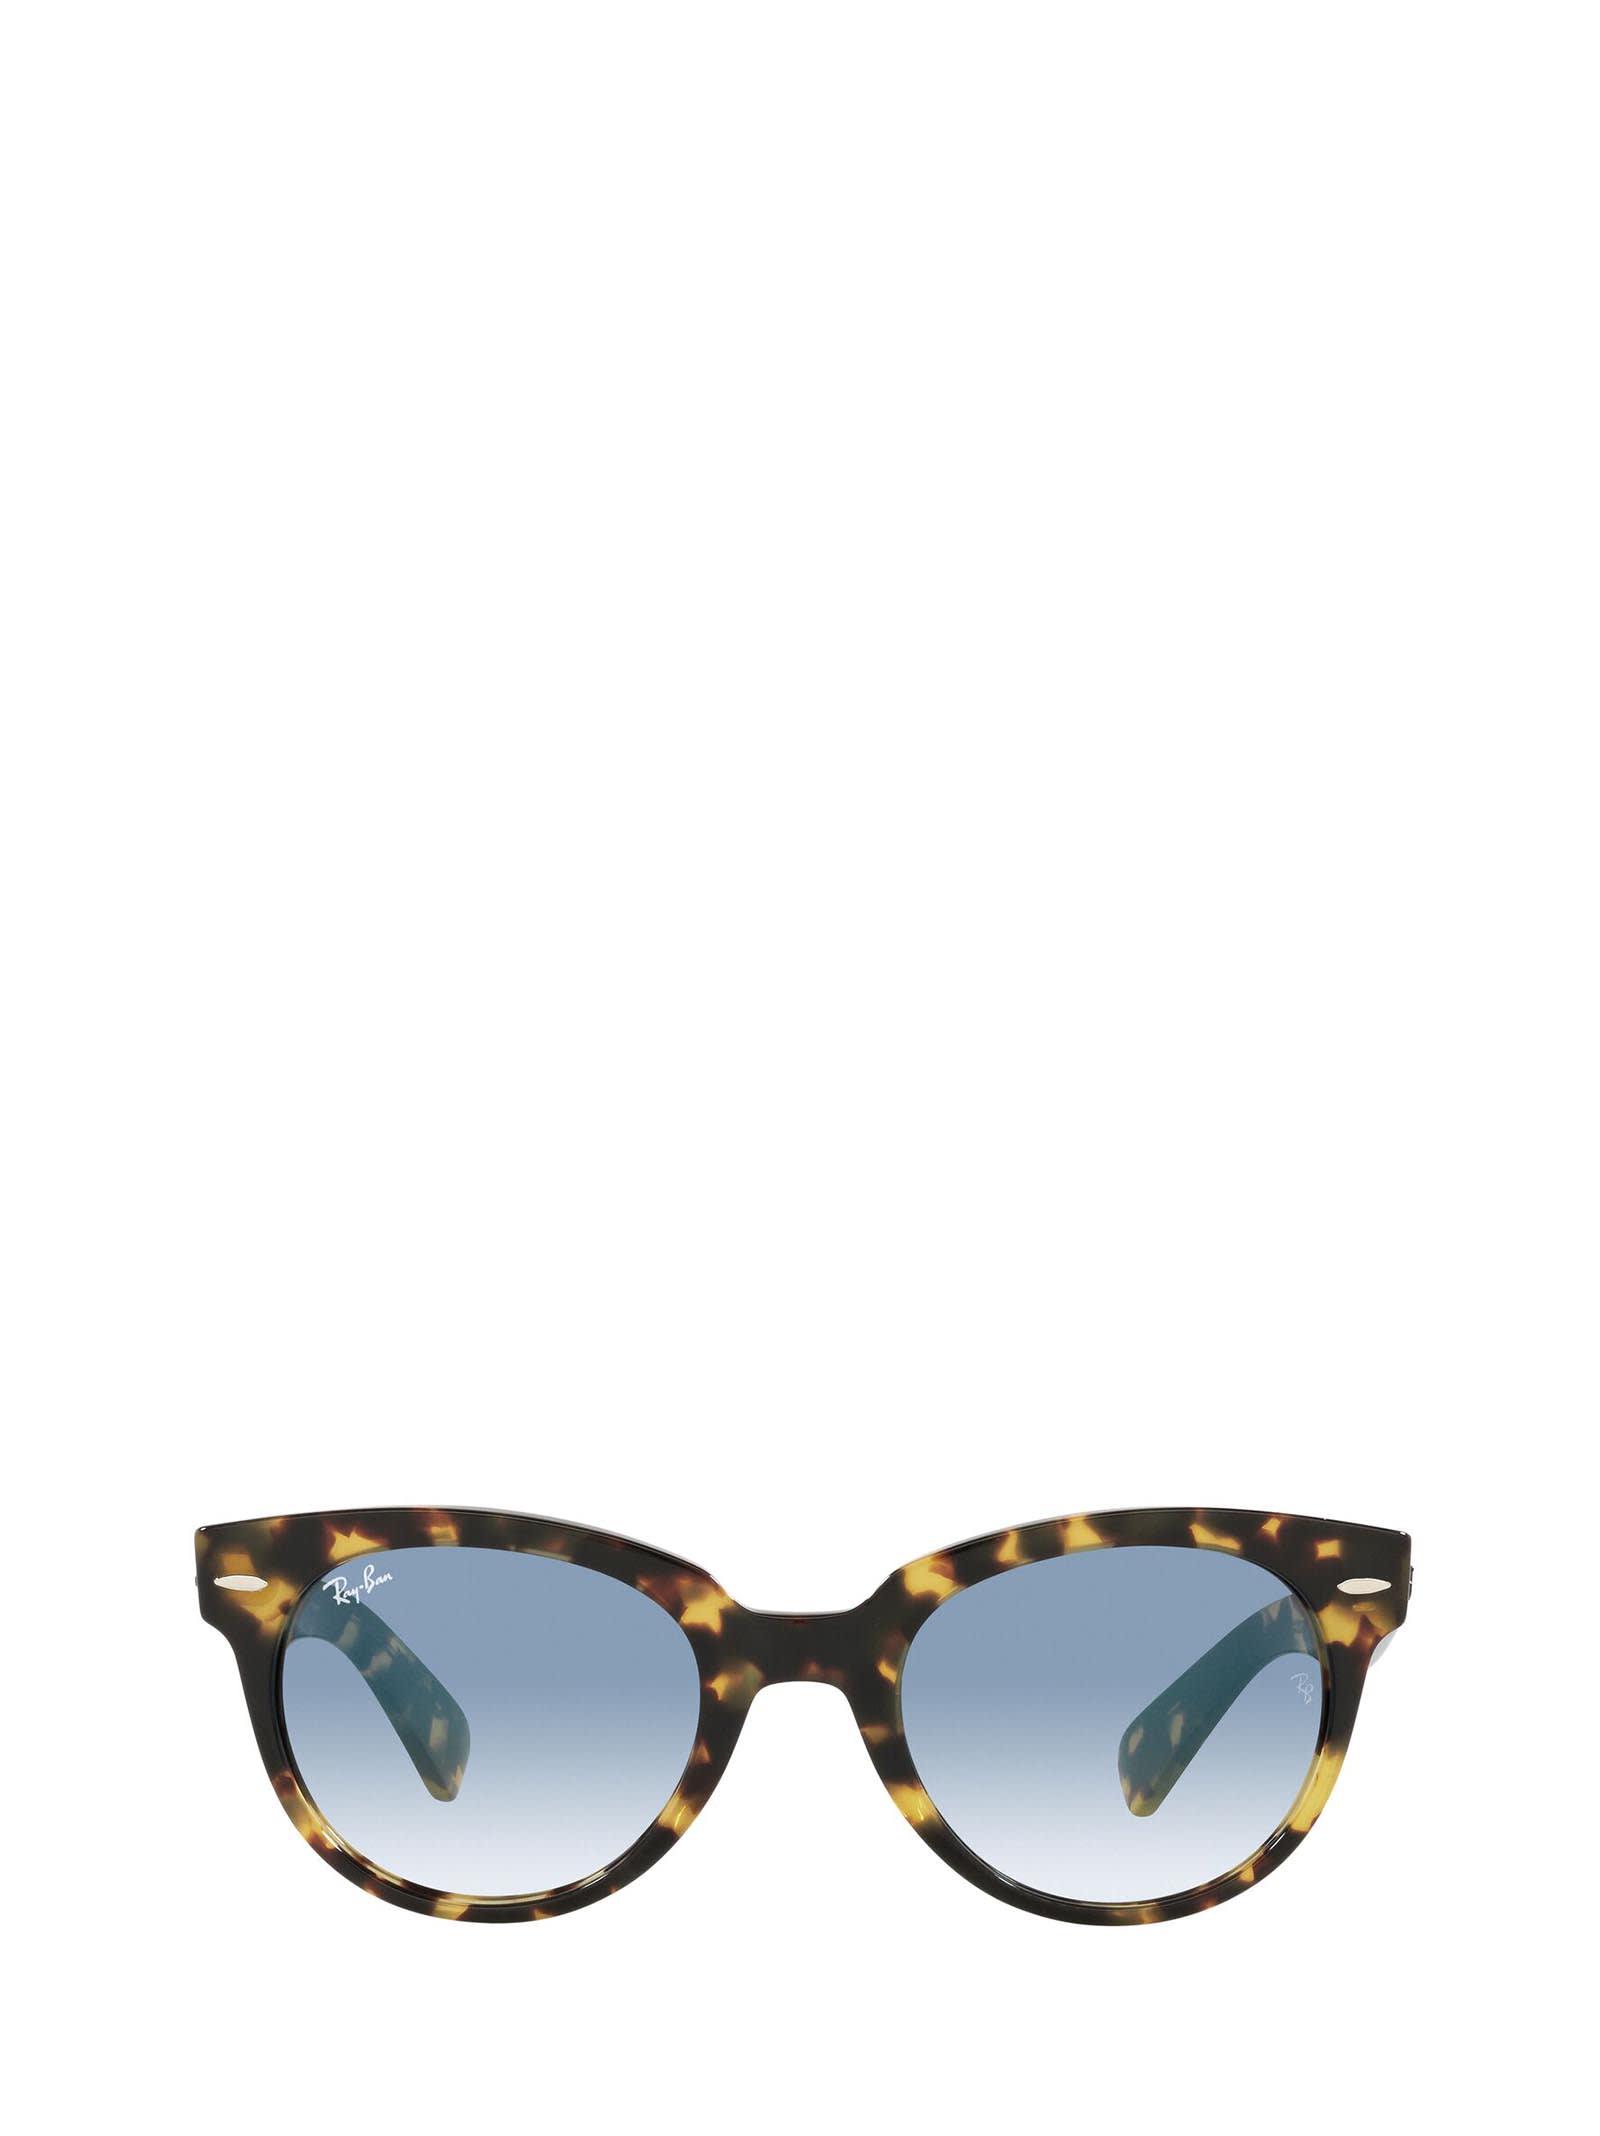 Ray-Ban Ray-ban Rb2201 Yellow Havana Sunglasses